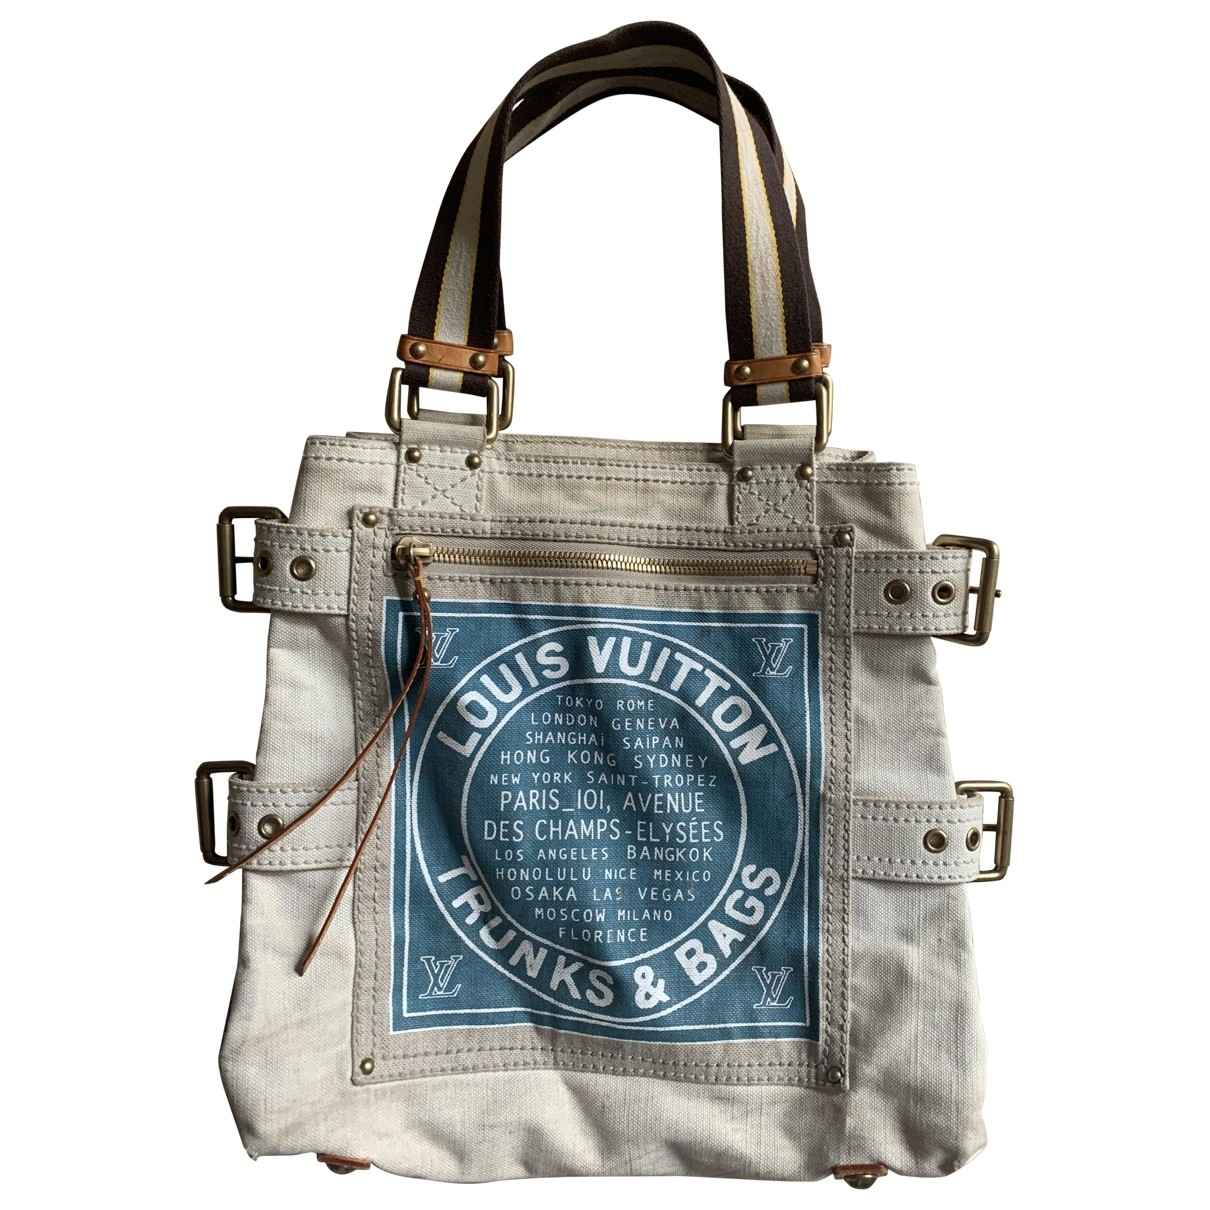 Louis Vuitton \N Beige Cotton handbag for Women \N